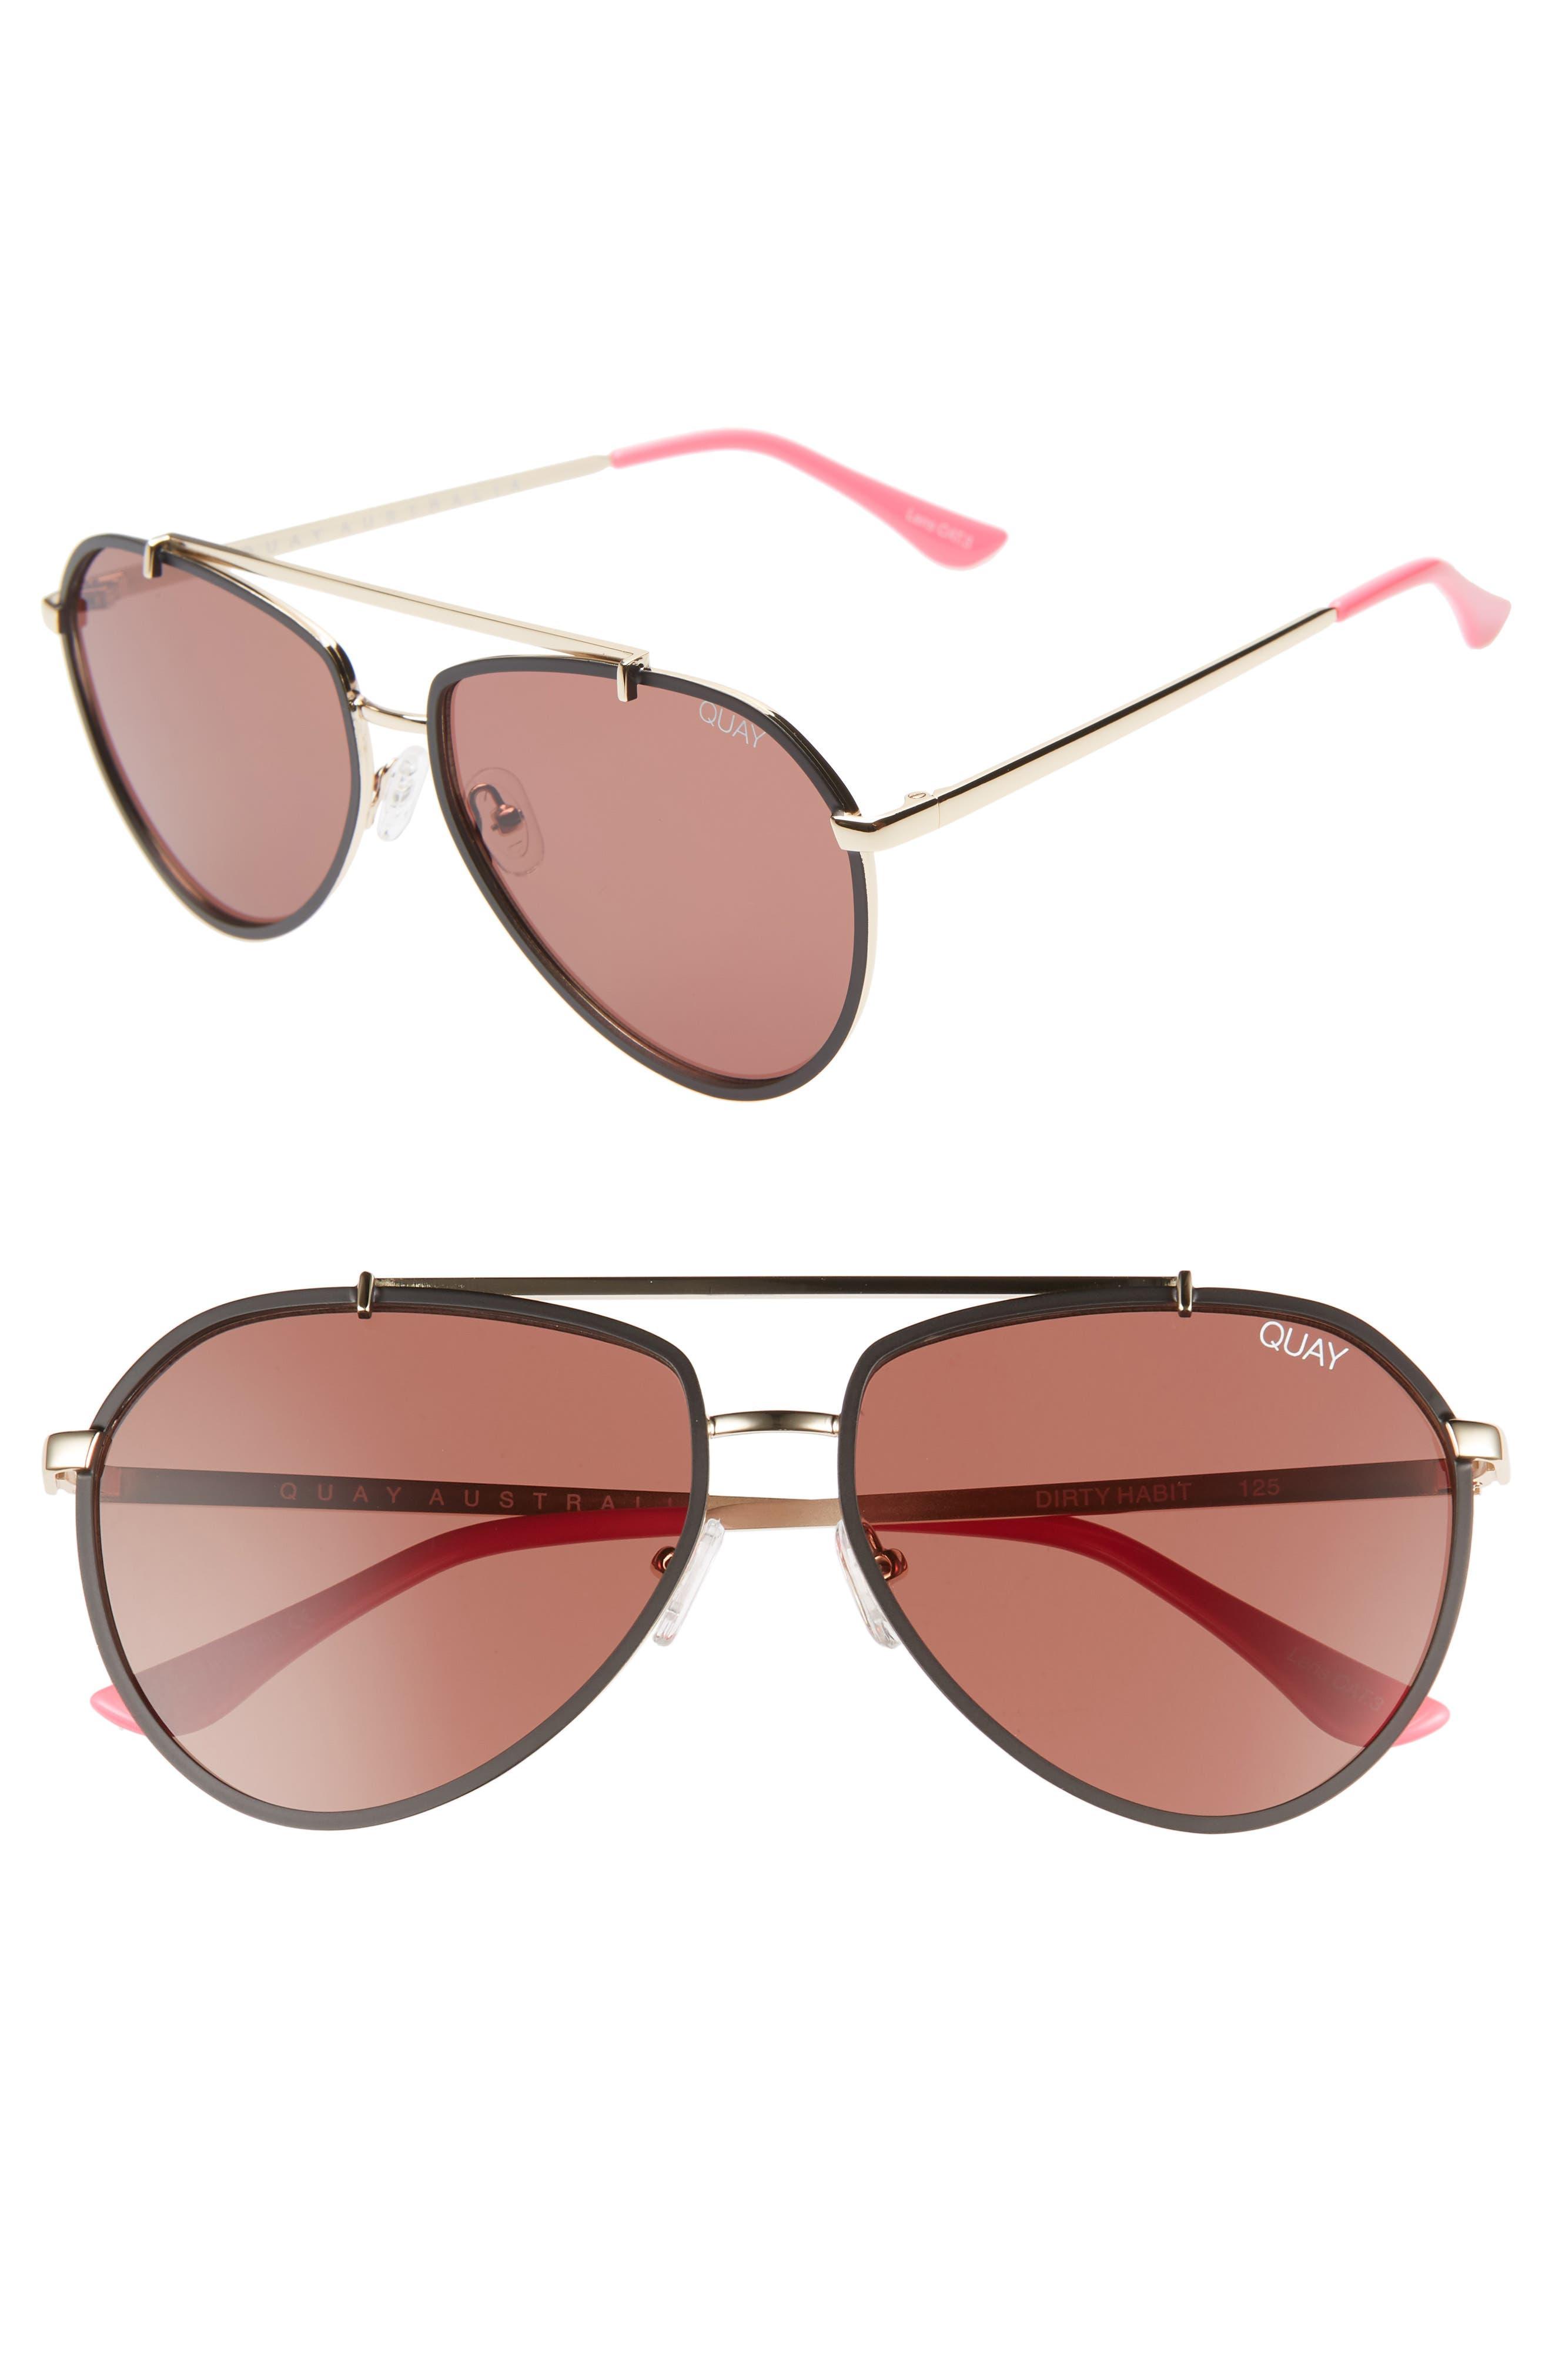 Quay Australia Dirty Habit 61Mm Aviator Sunglasses - Gold/ Brown